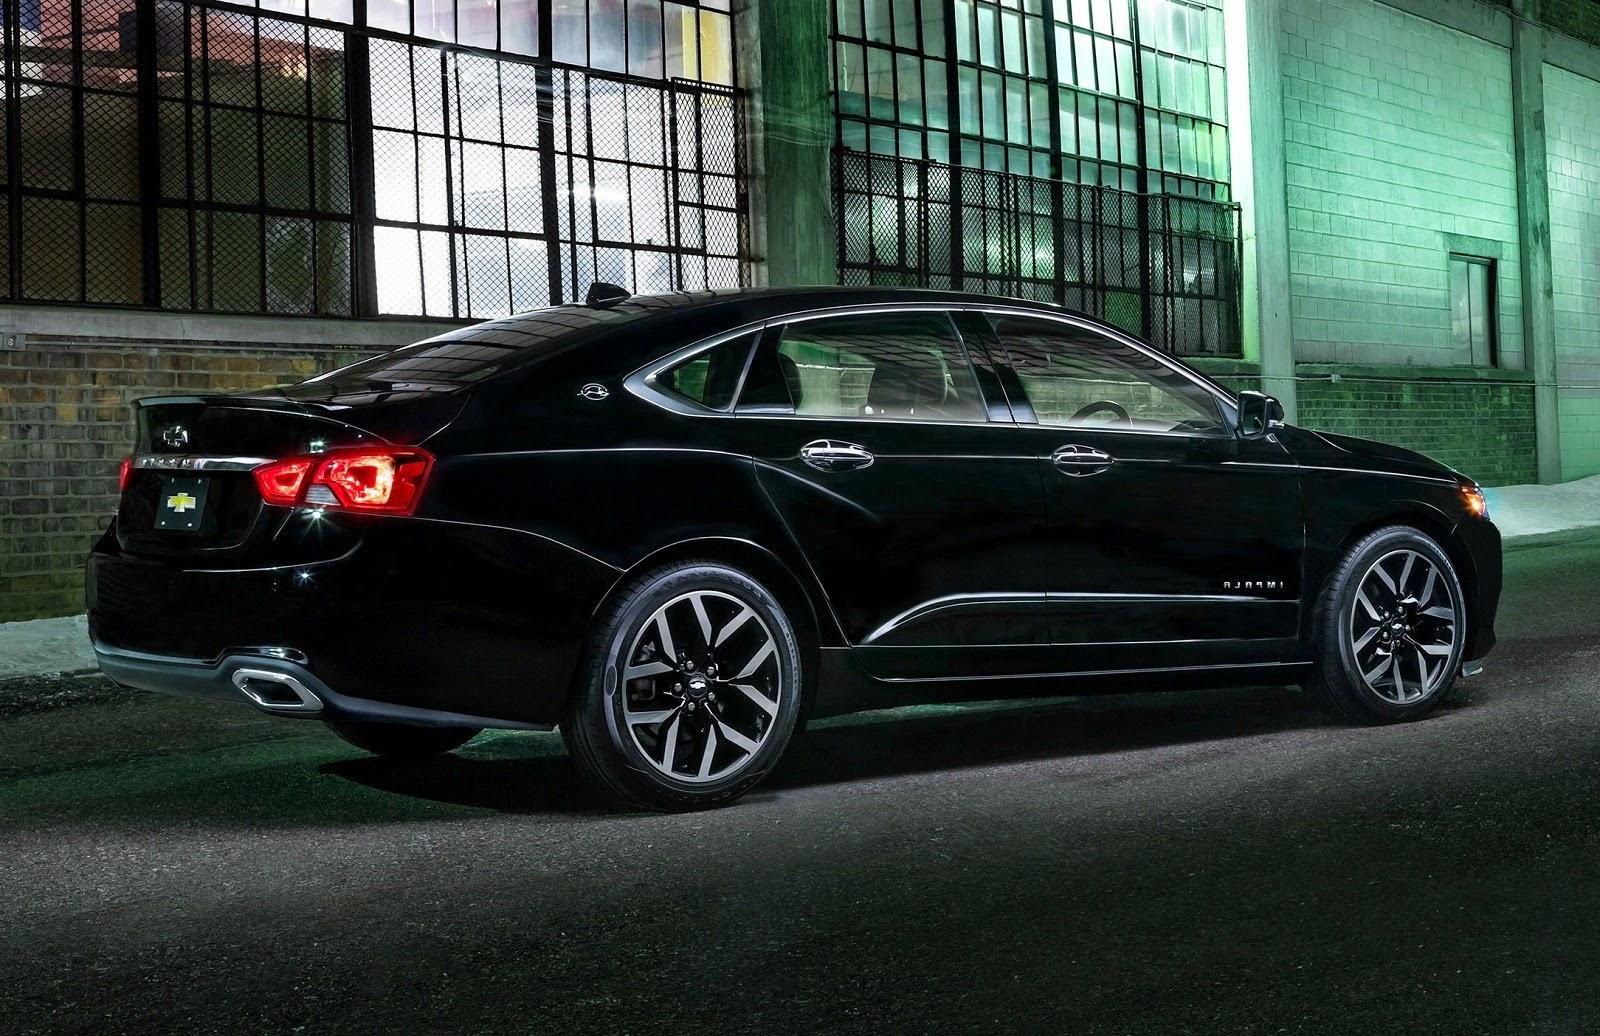 Chevrolet Impala S Dark Side Midnight Edition Car Reviews New